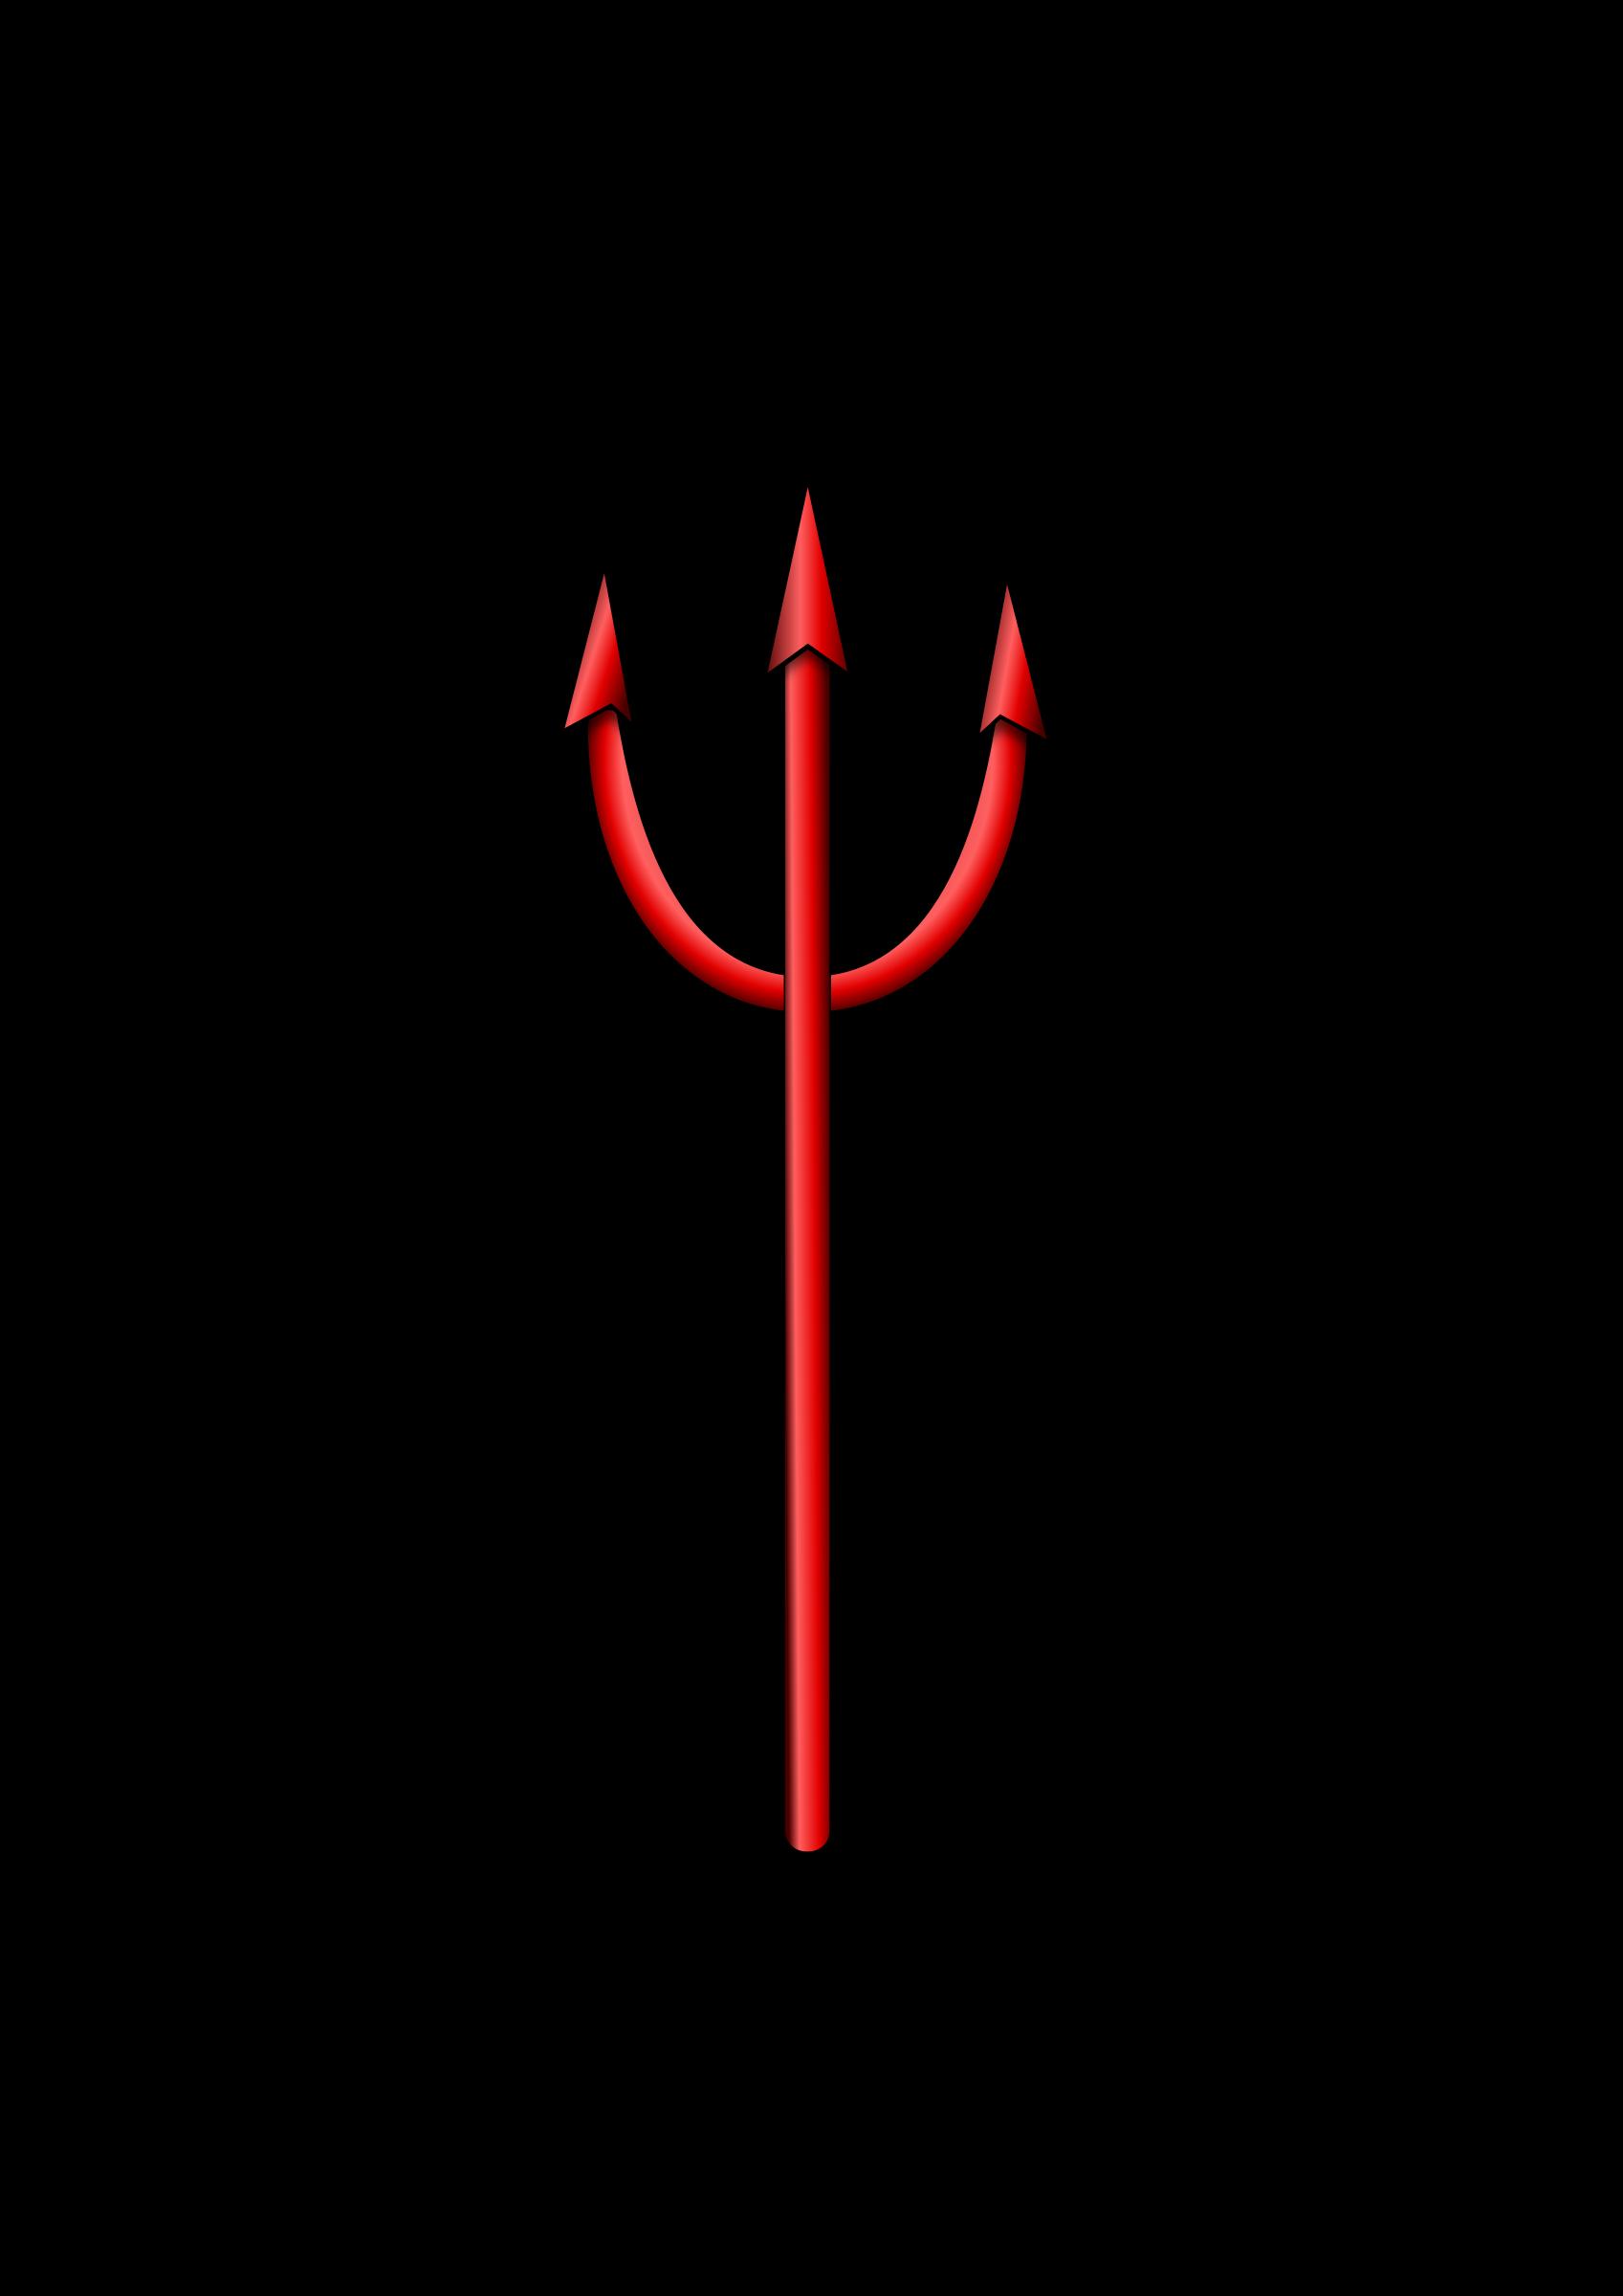 Pitchfork clipart trident Devil devil Clipart pitchfork pitchfork